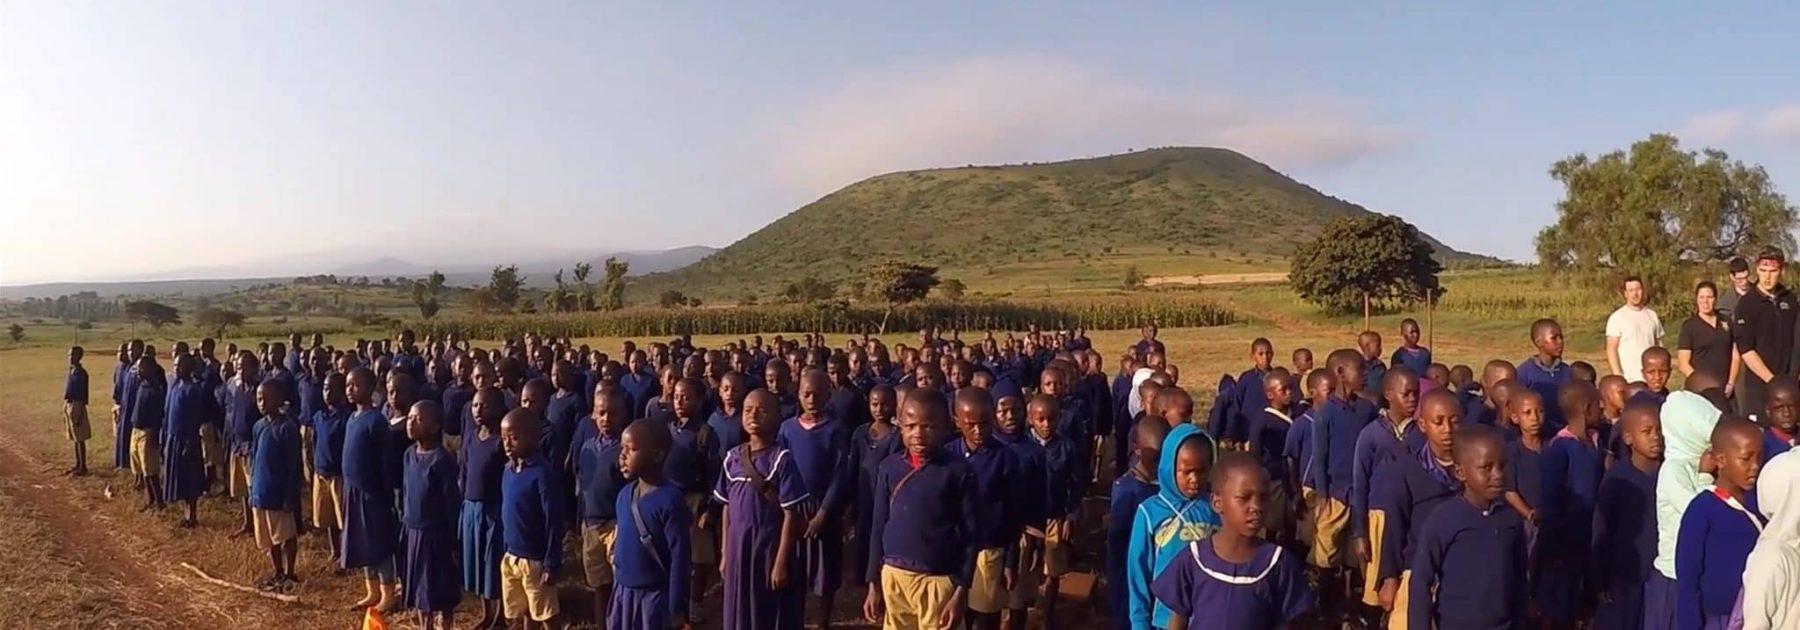 Lerang' wa School – Tanzania